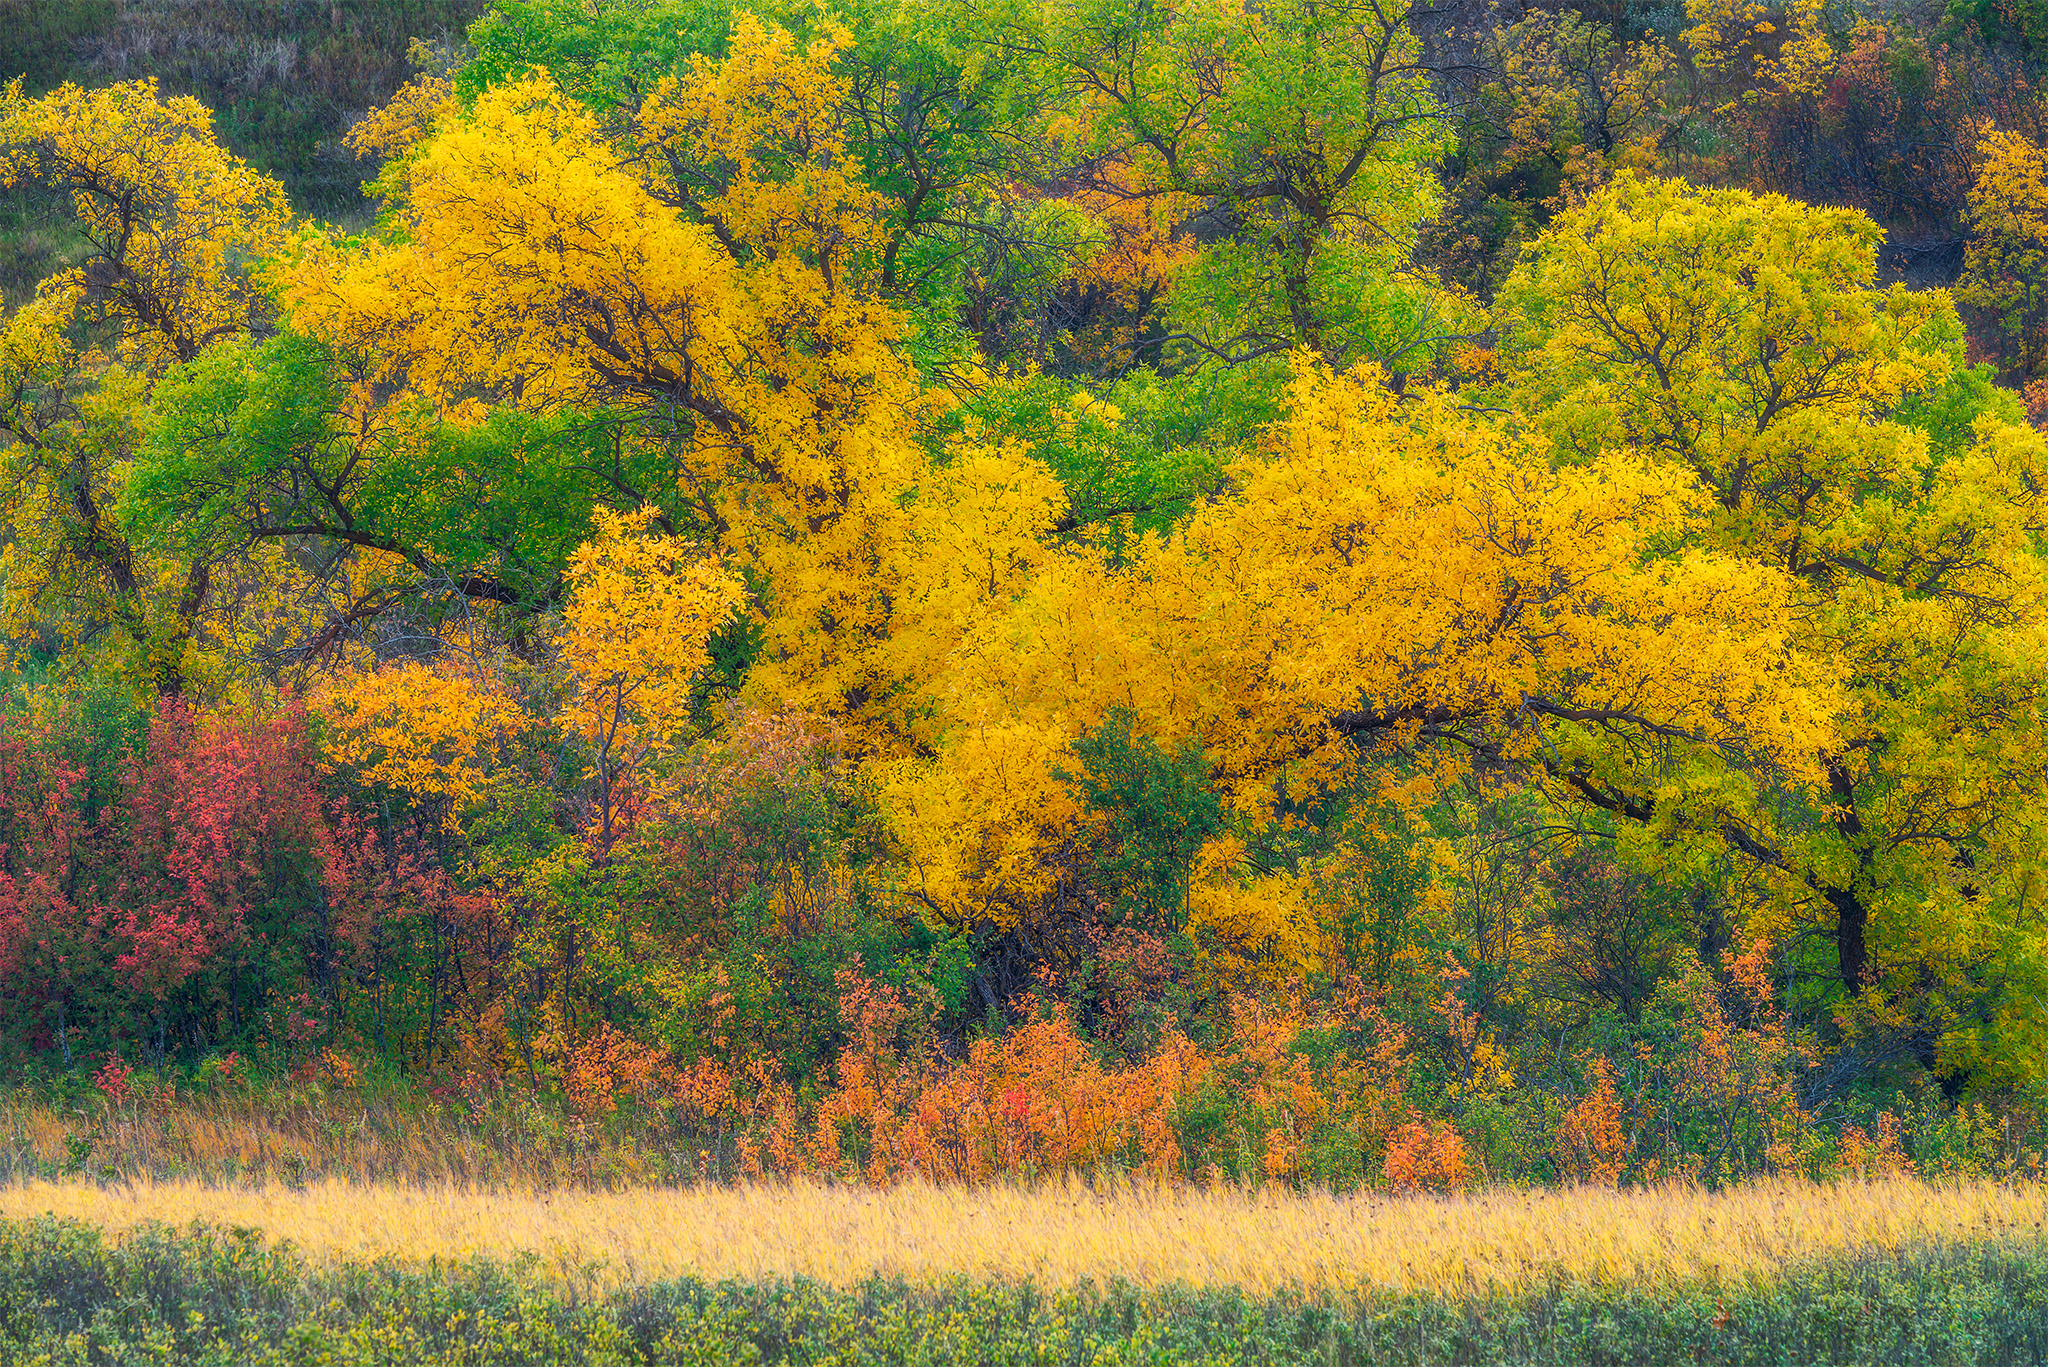 An intimate landscape photograph of fall foliage in Wascana Trails, Saskatchewan